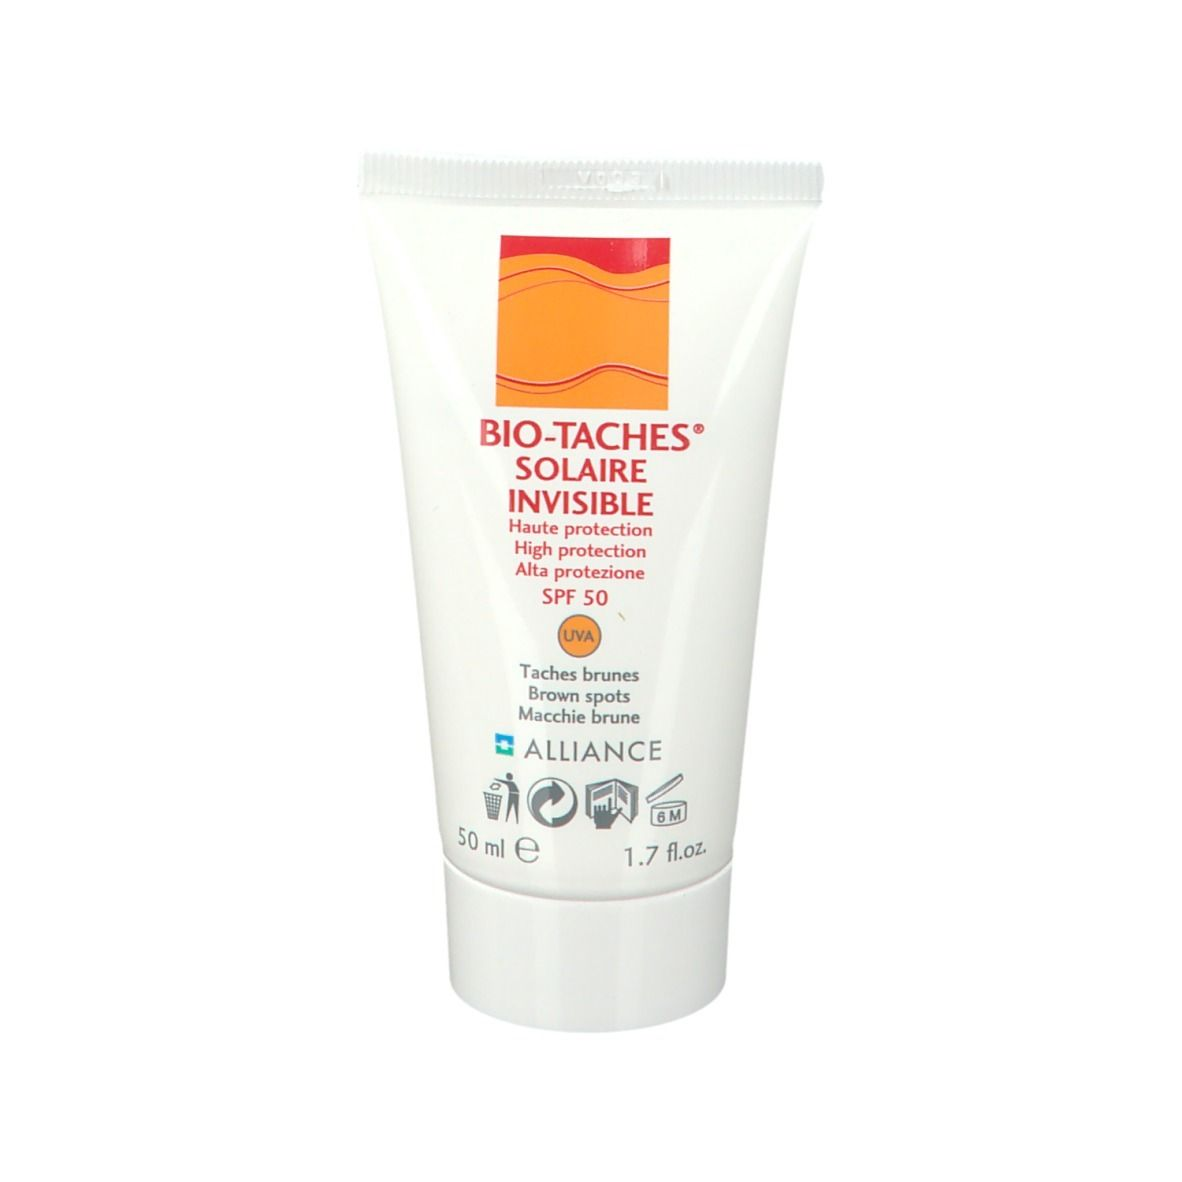 Afbeelding van Bio-Taches® Solaire Invisible Crème solaire SPF 50